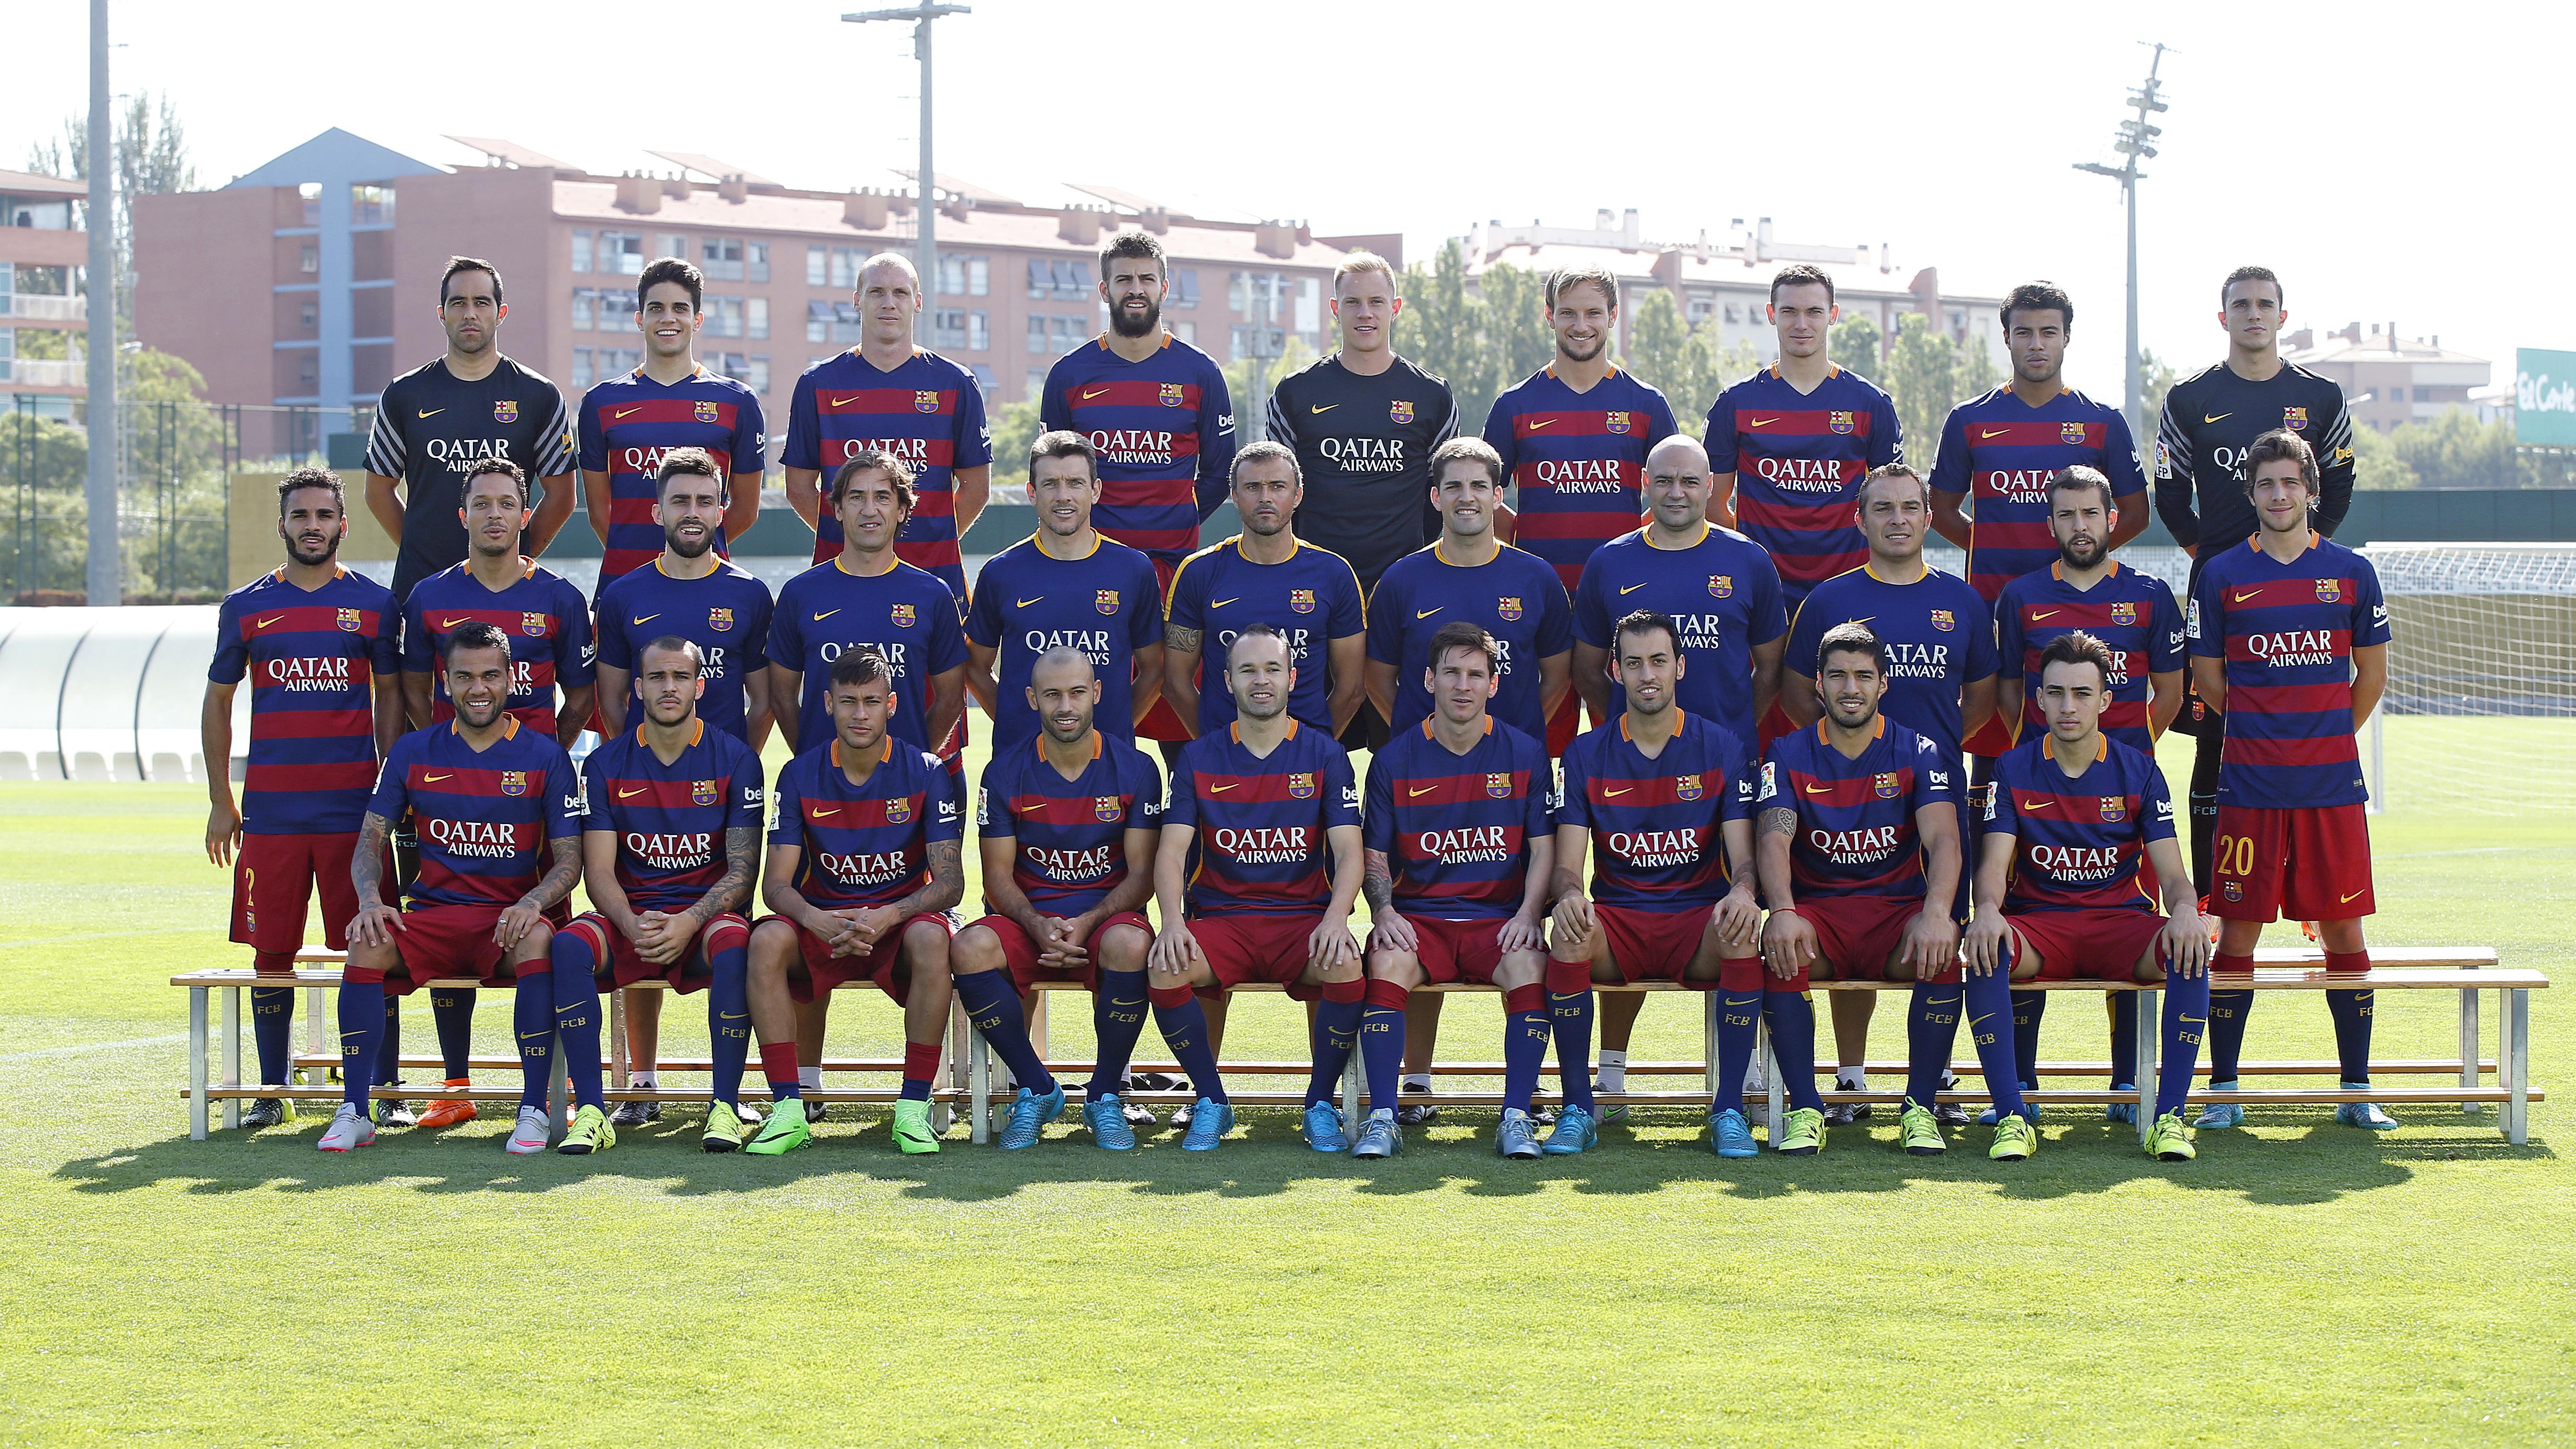 FC Barcelona Backgrounds, Compatible - PC, Mobile, Gadgets  4918x2766 px